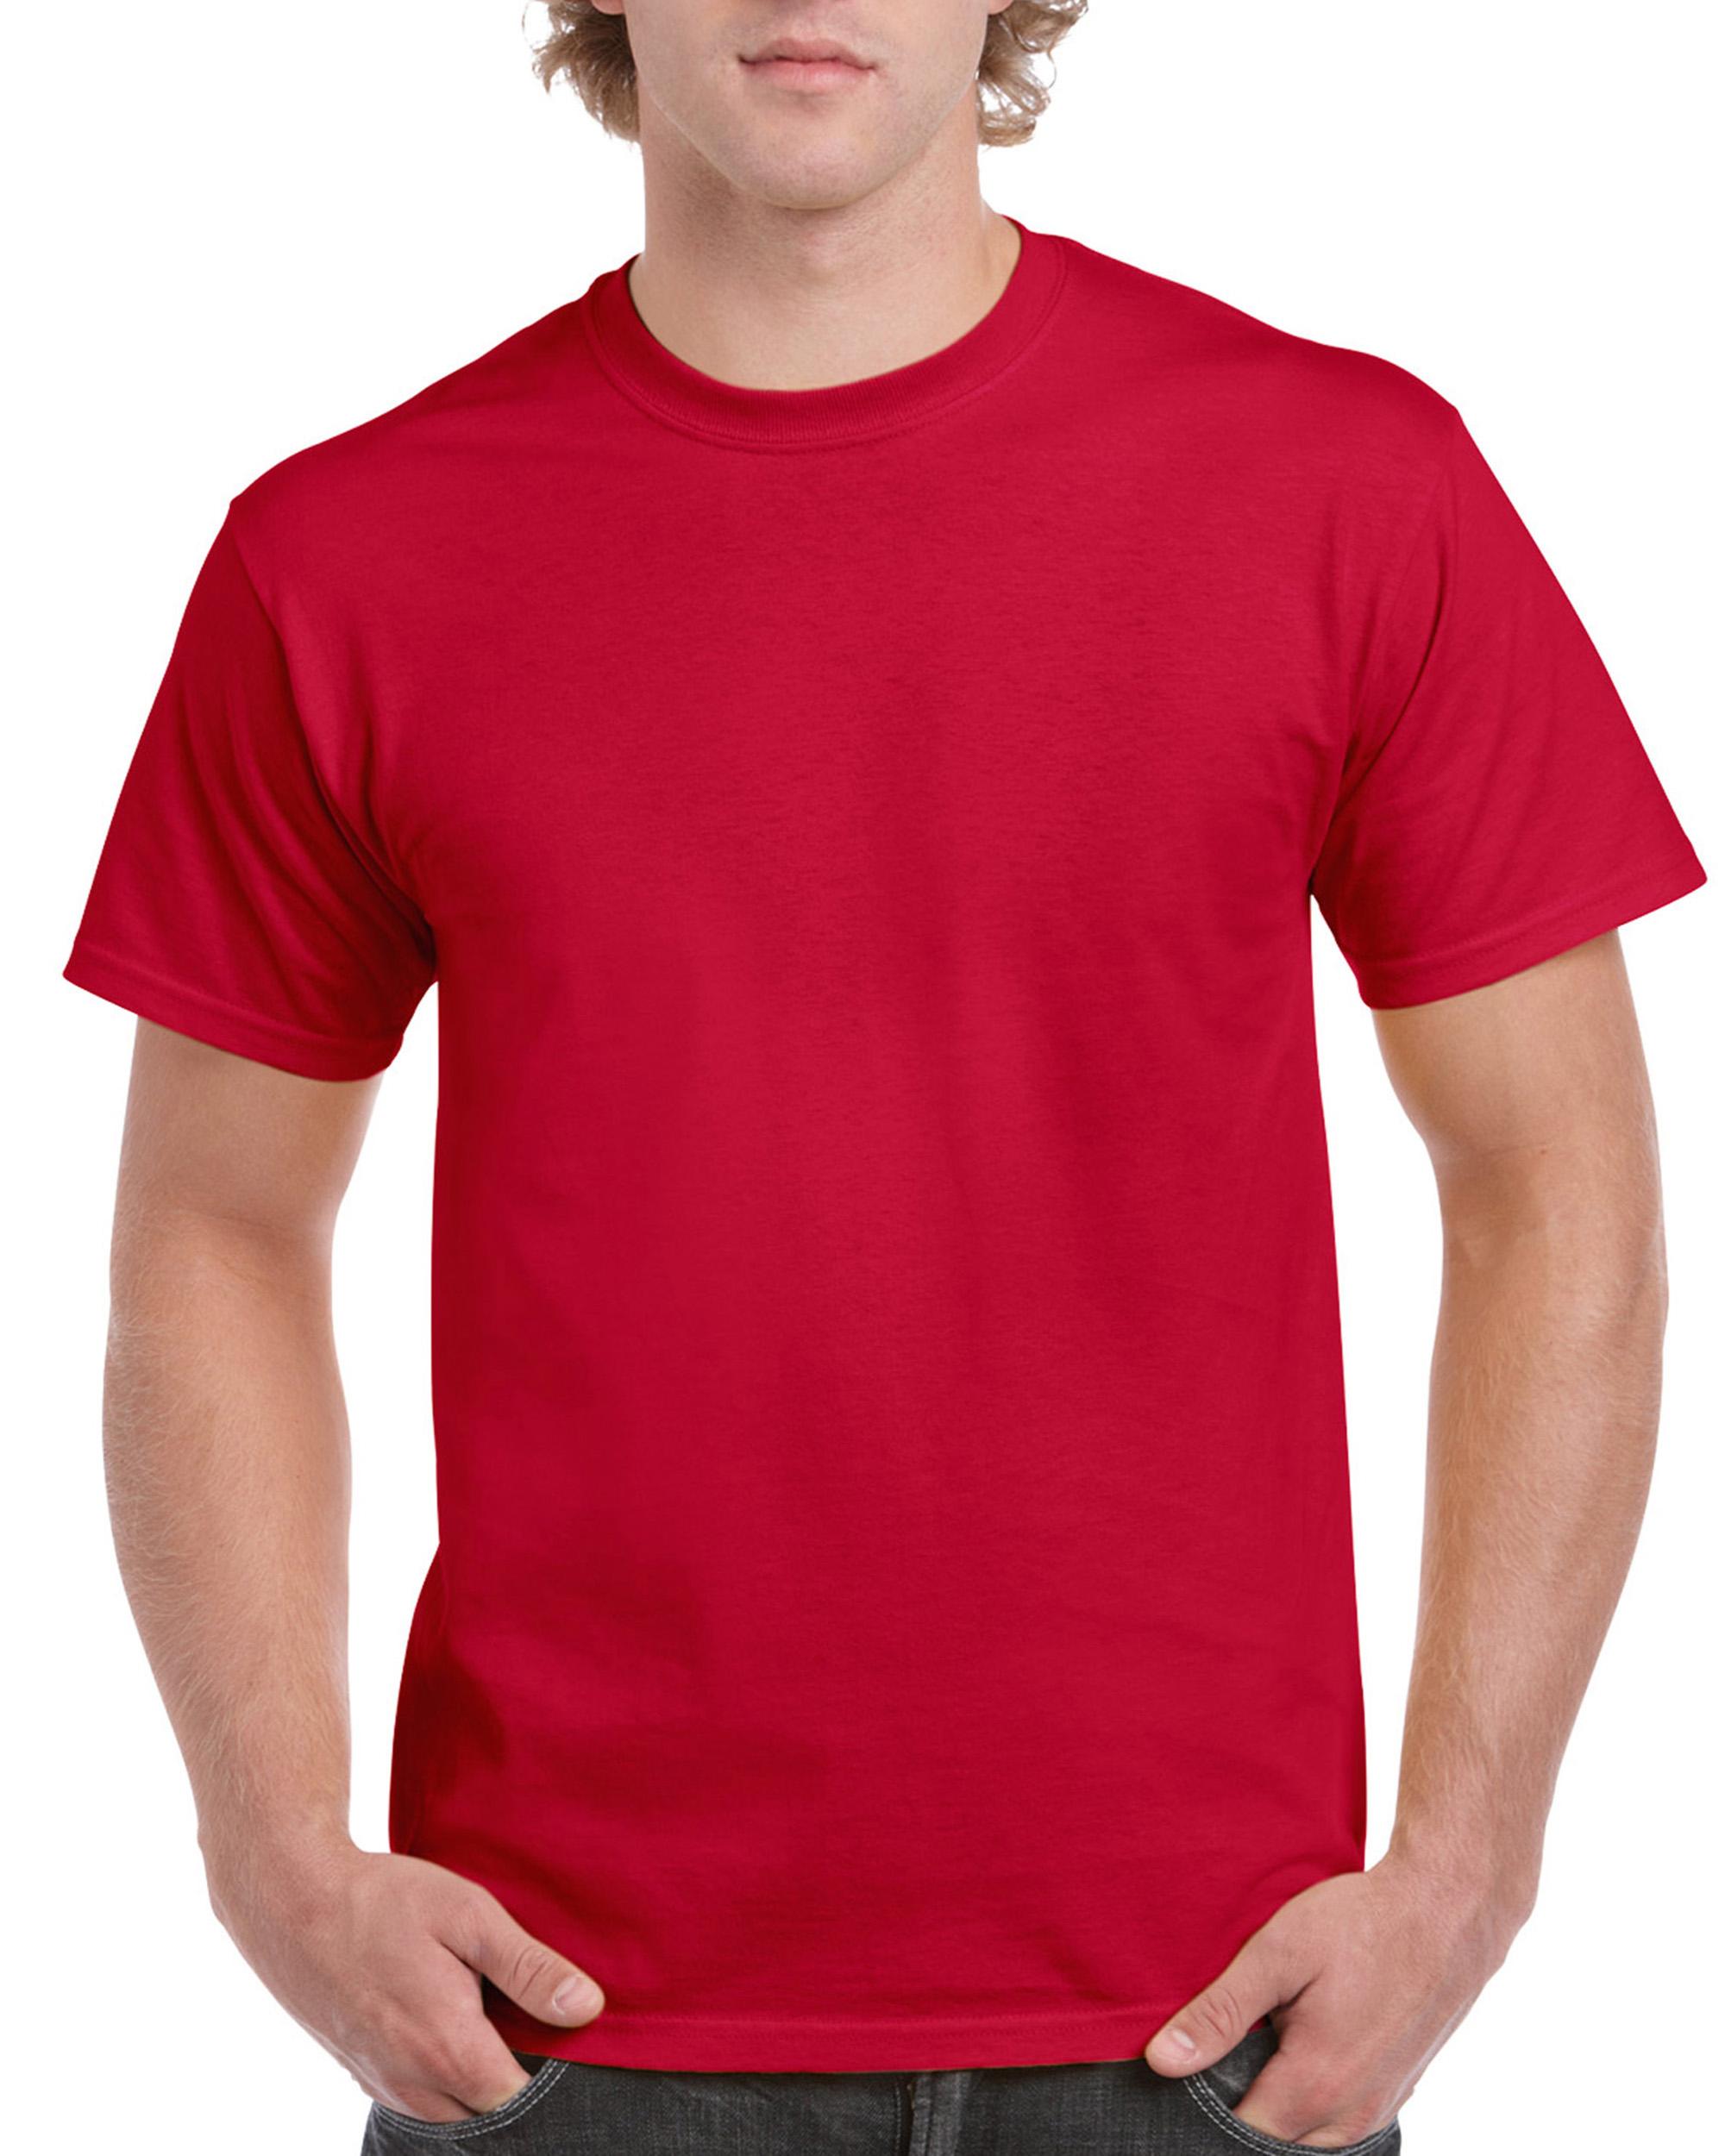 1c9ade4a0 2000 Gildan Adult Ultra Cotton® 6 oz. T-Shirt